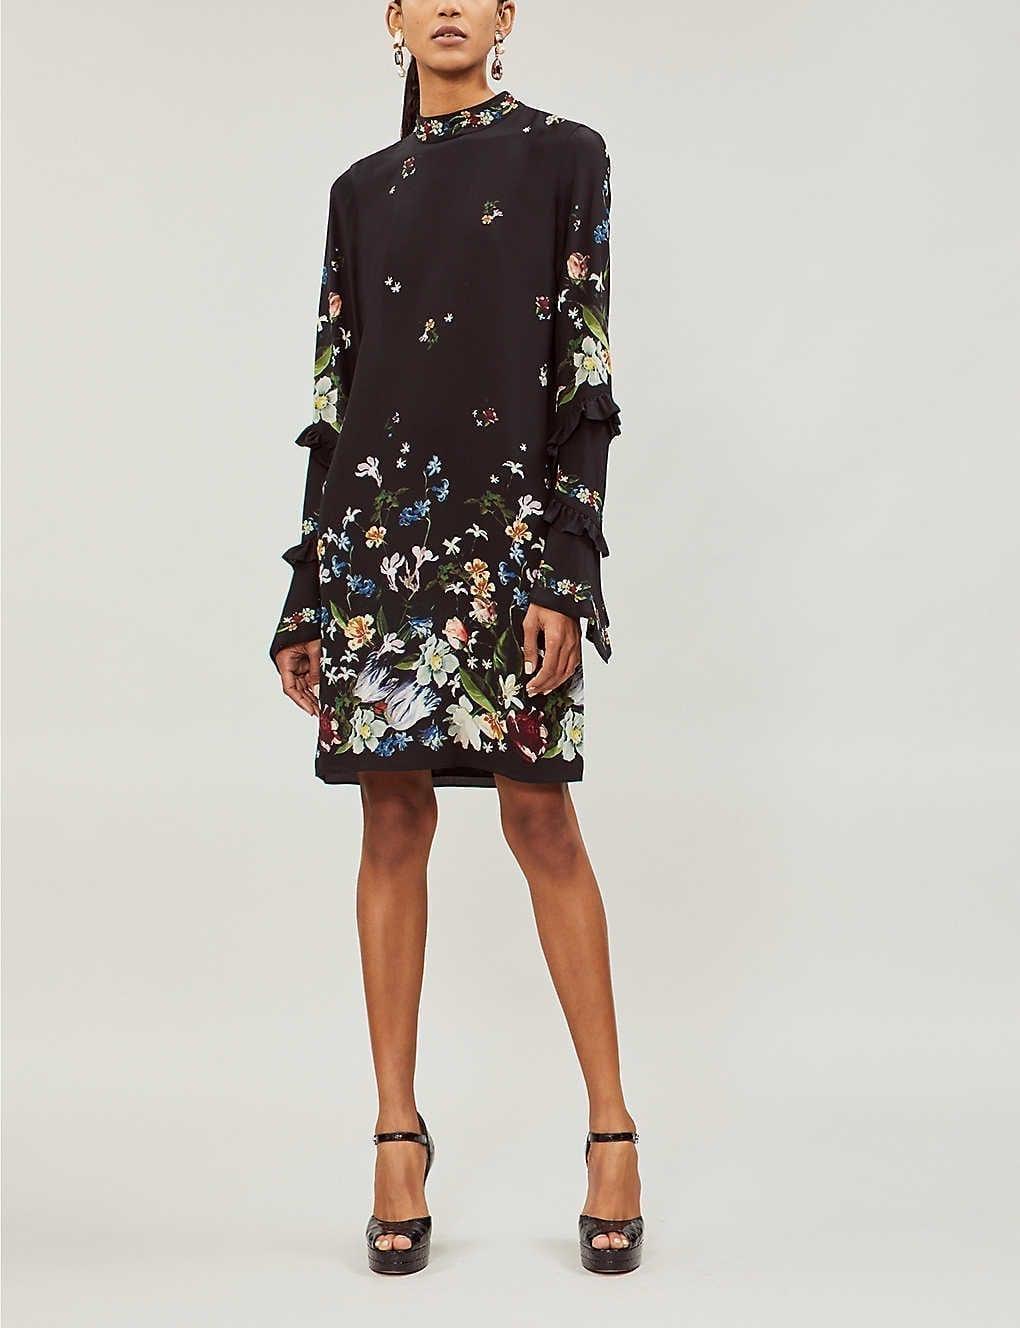 Erdem Manon Silk-crepe Black Dress